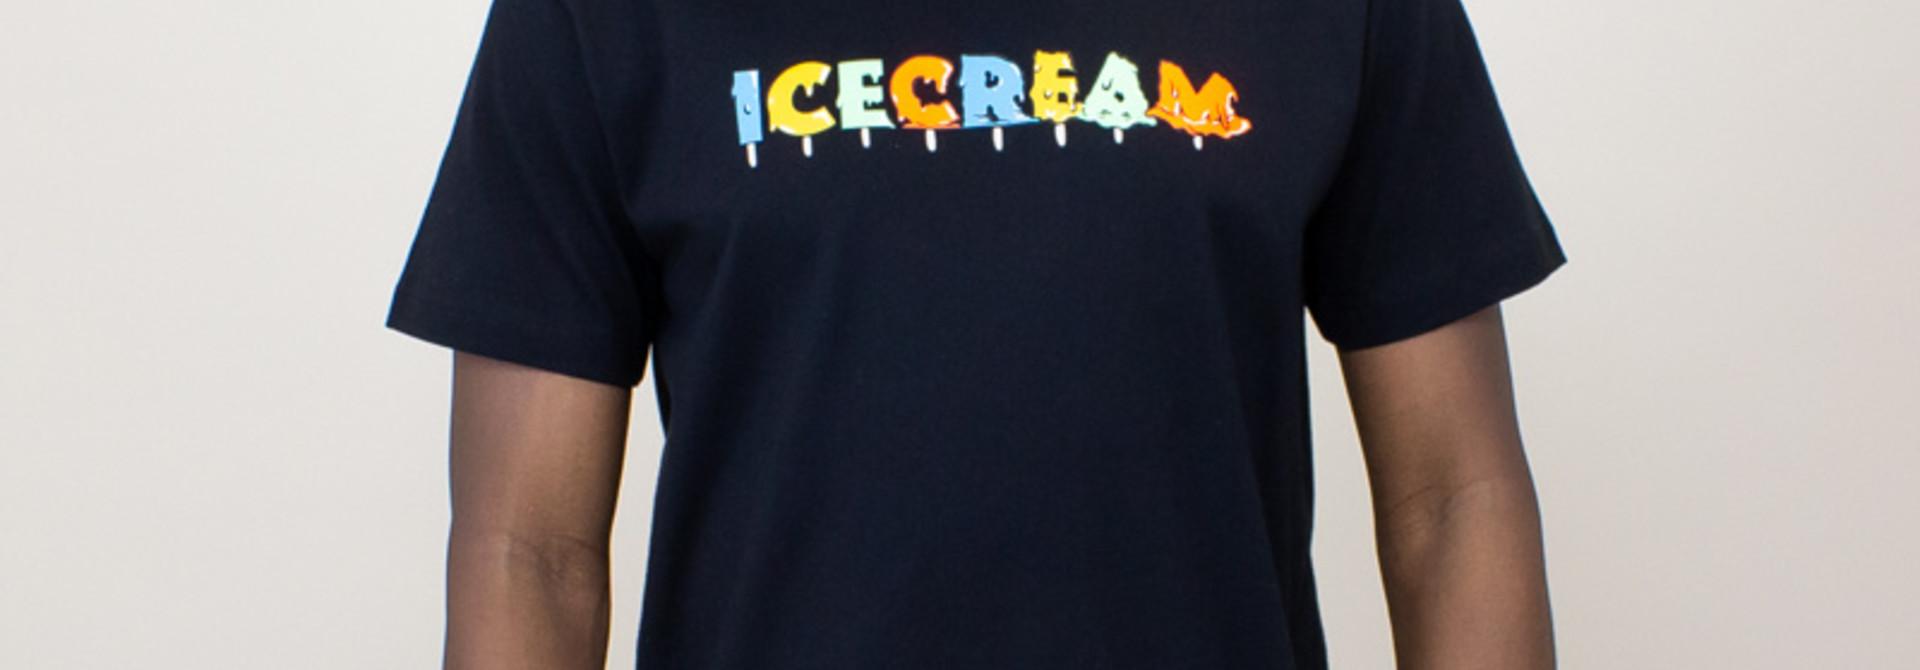 Icecream Drip S/S Tee - Black